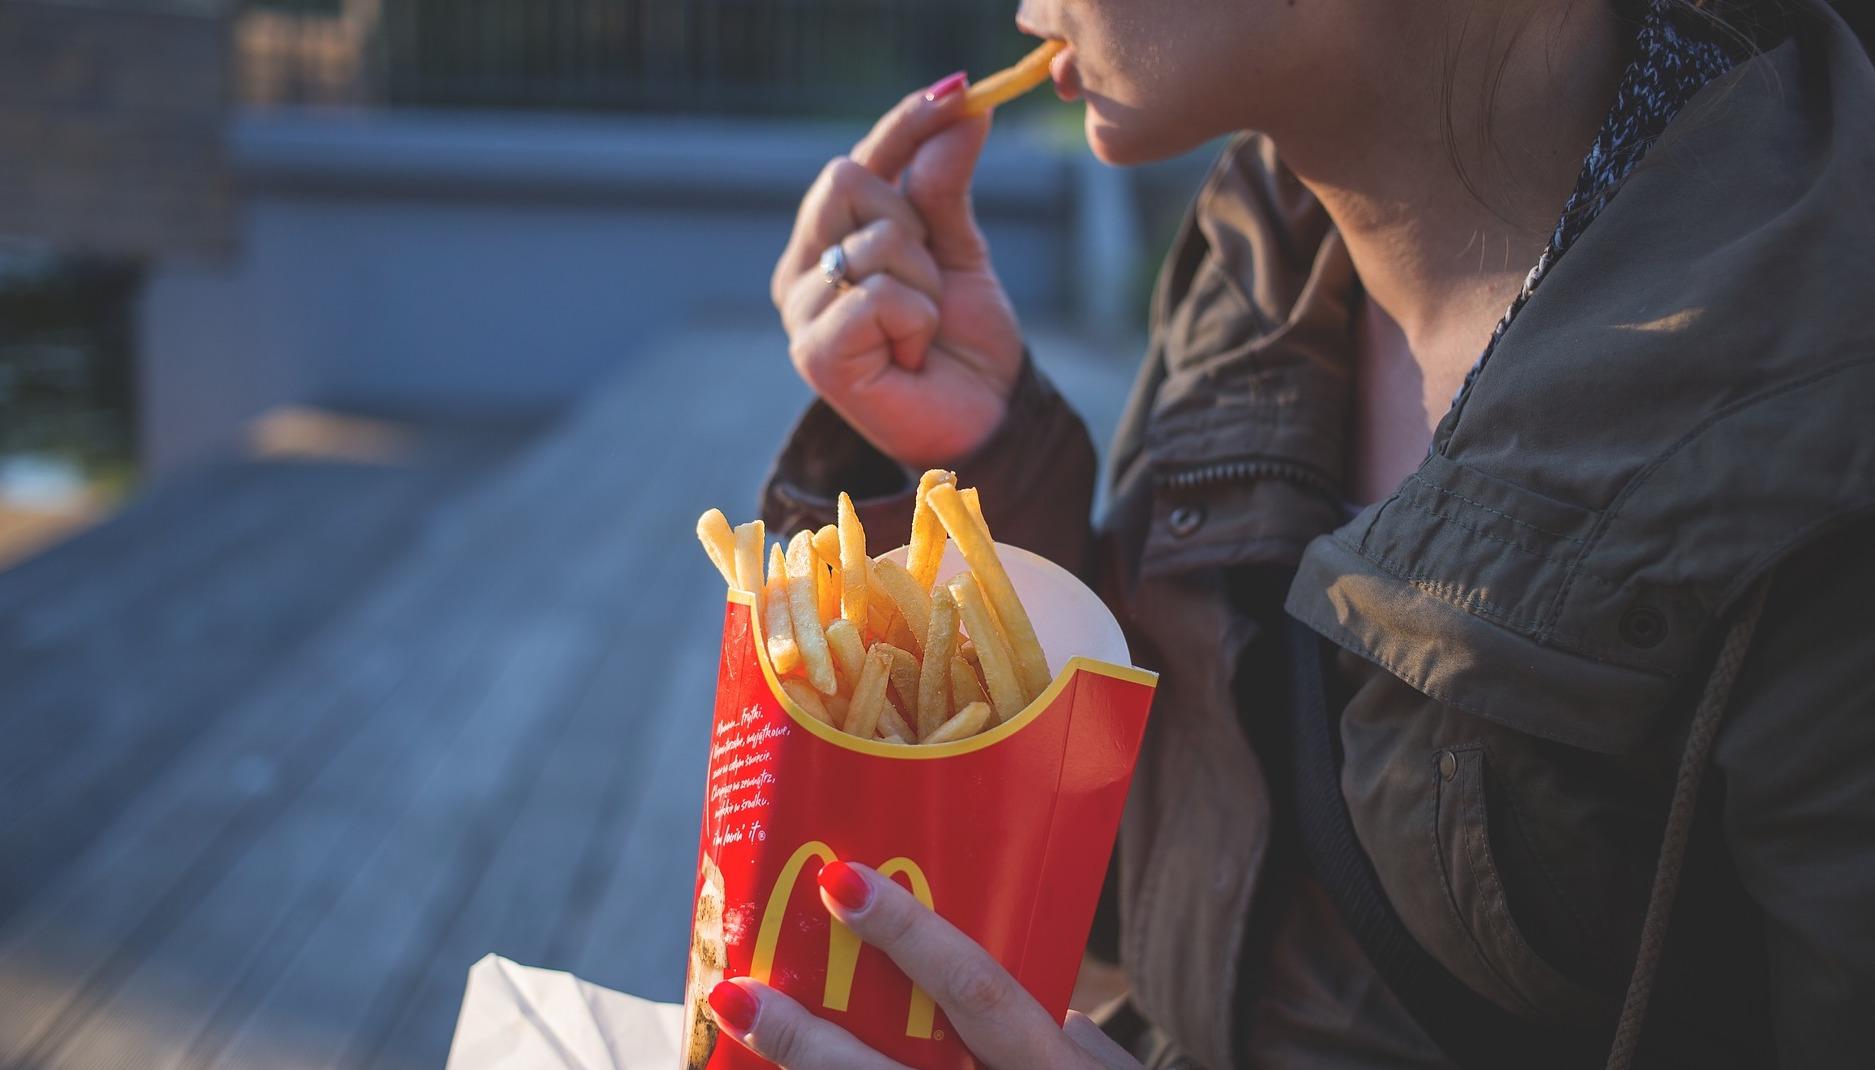 When will McDonald's reopen in the UK? Latest news amid the coronavirus lockdown